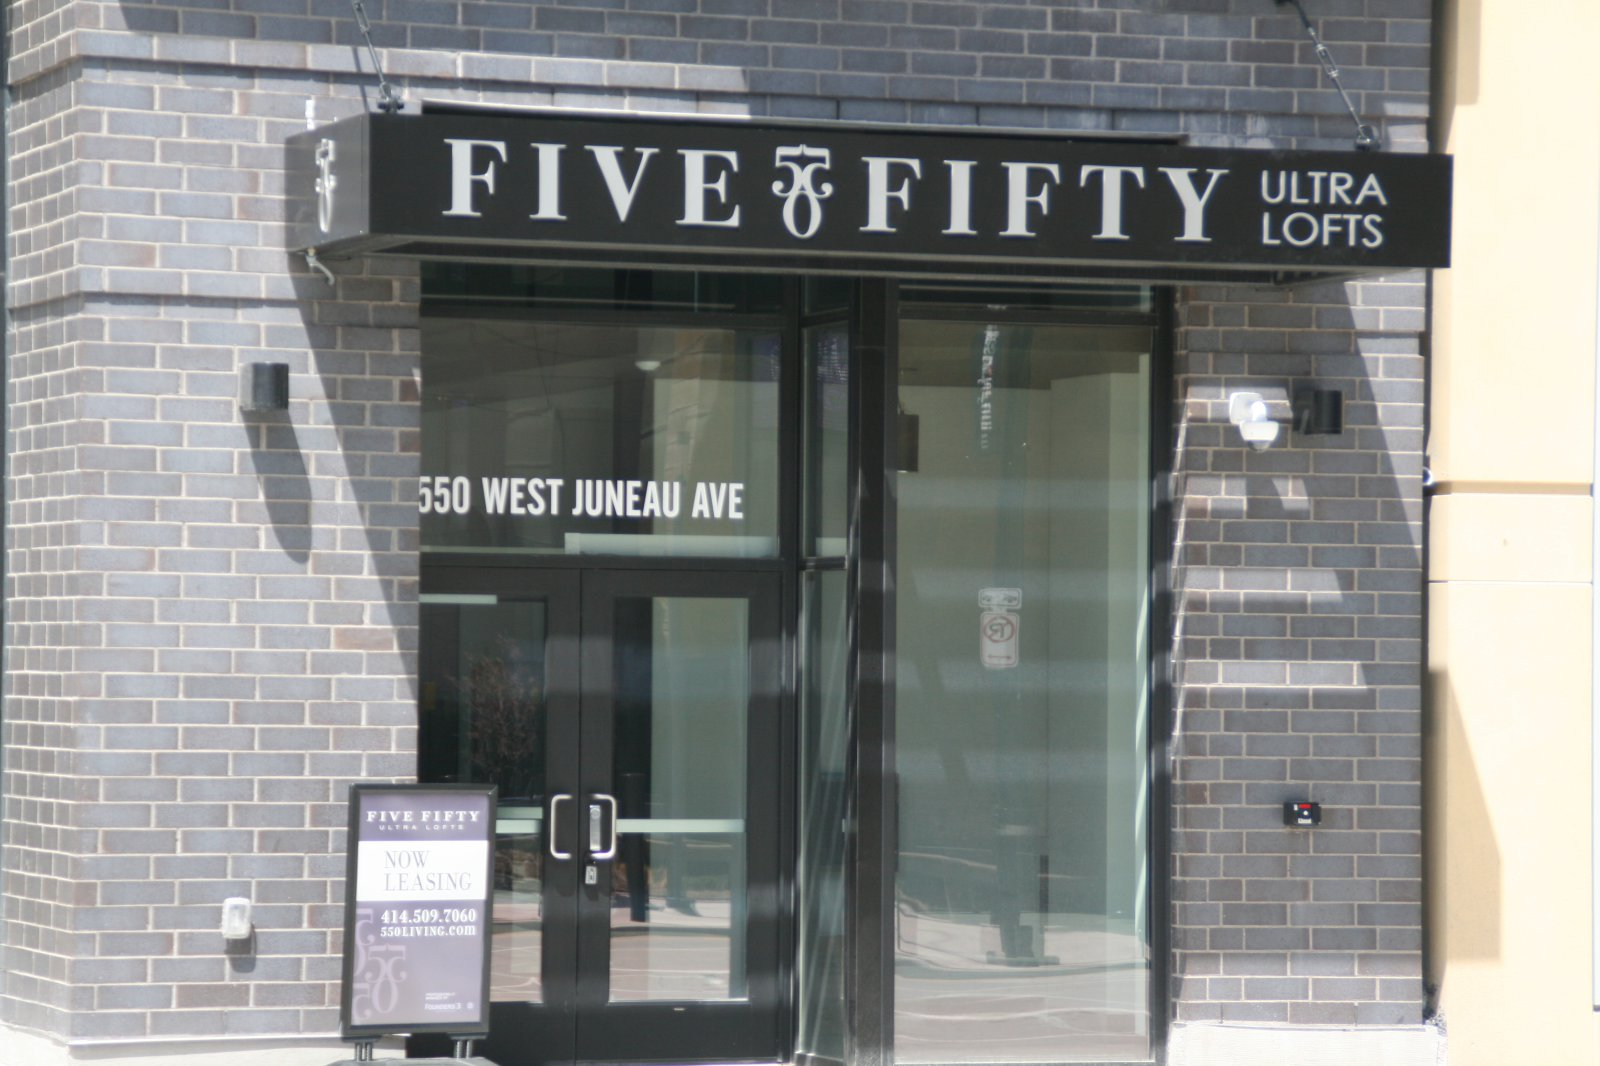 Five Fifty Ultra Lofts Lobby